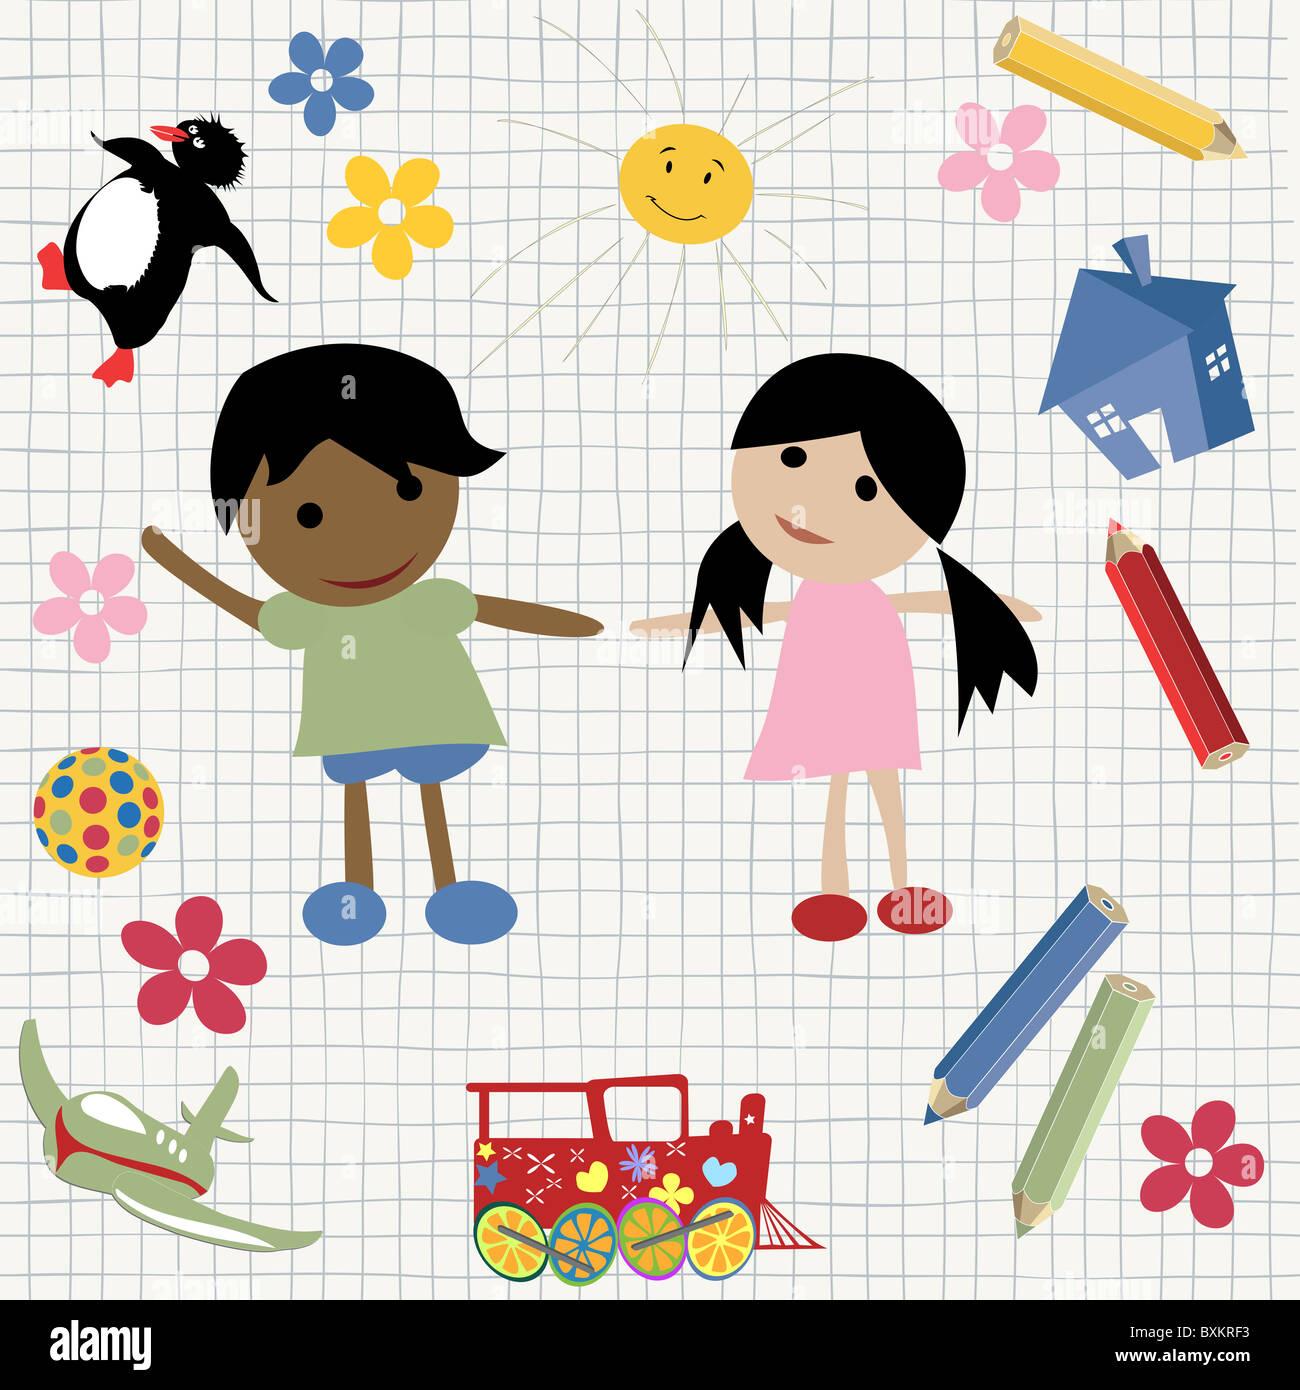 Kindlichen design Stockbild